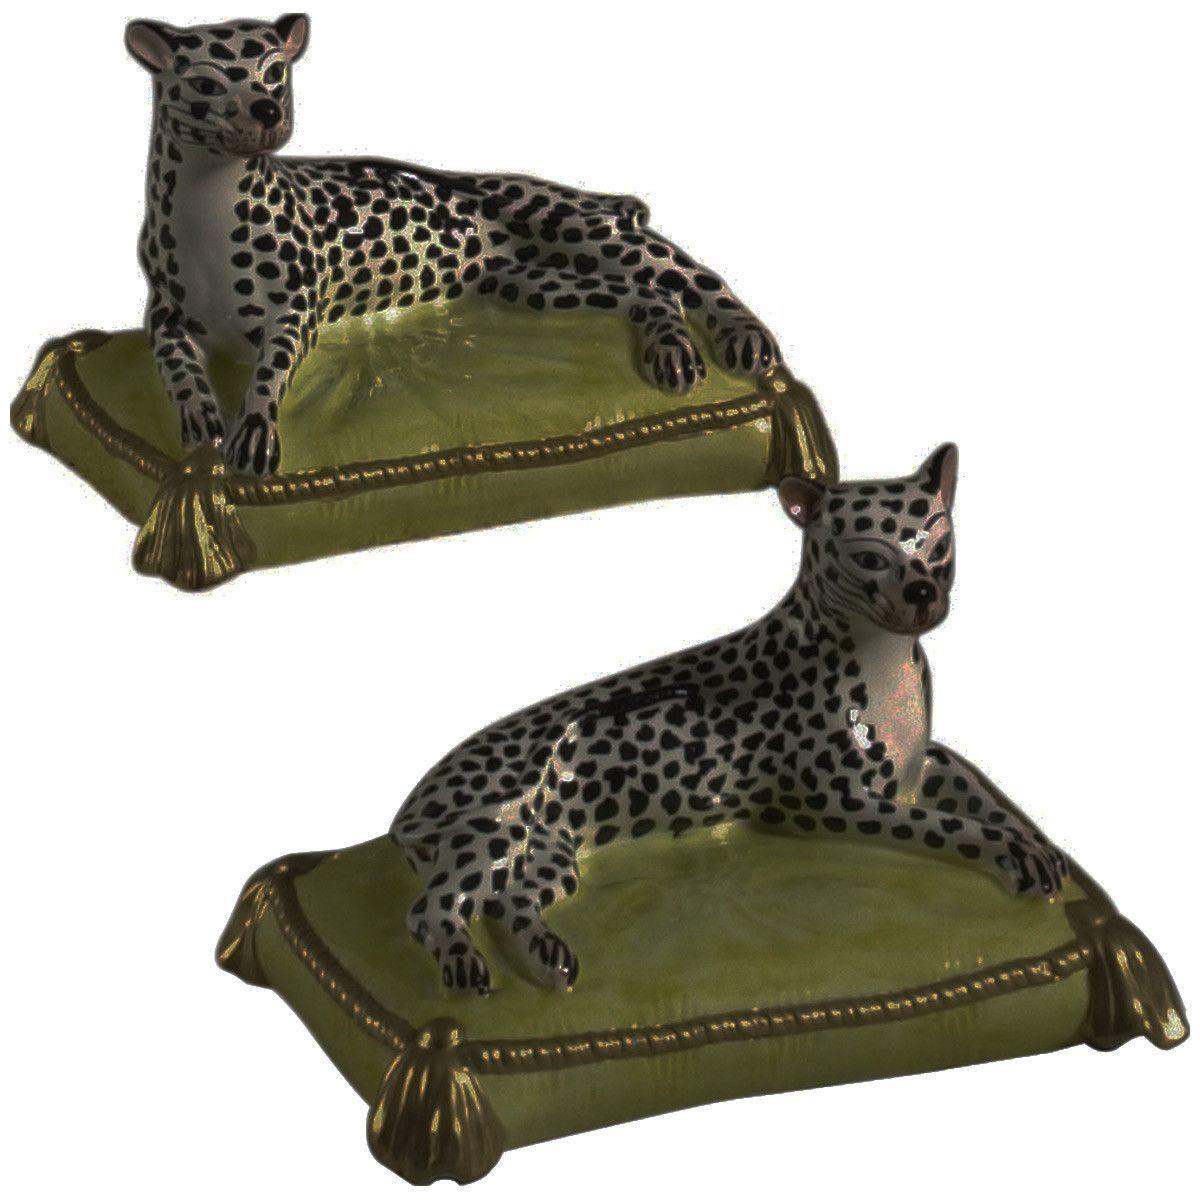 Chelsea House 43-0022 Leopards Figurine - Pair